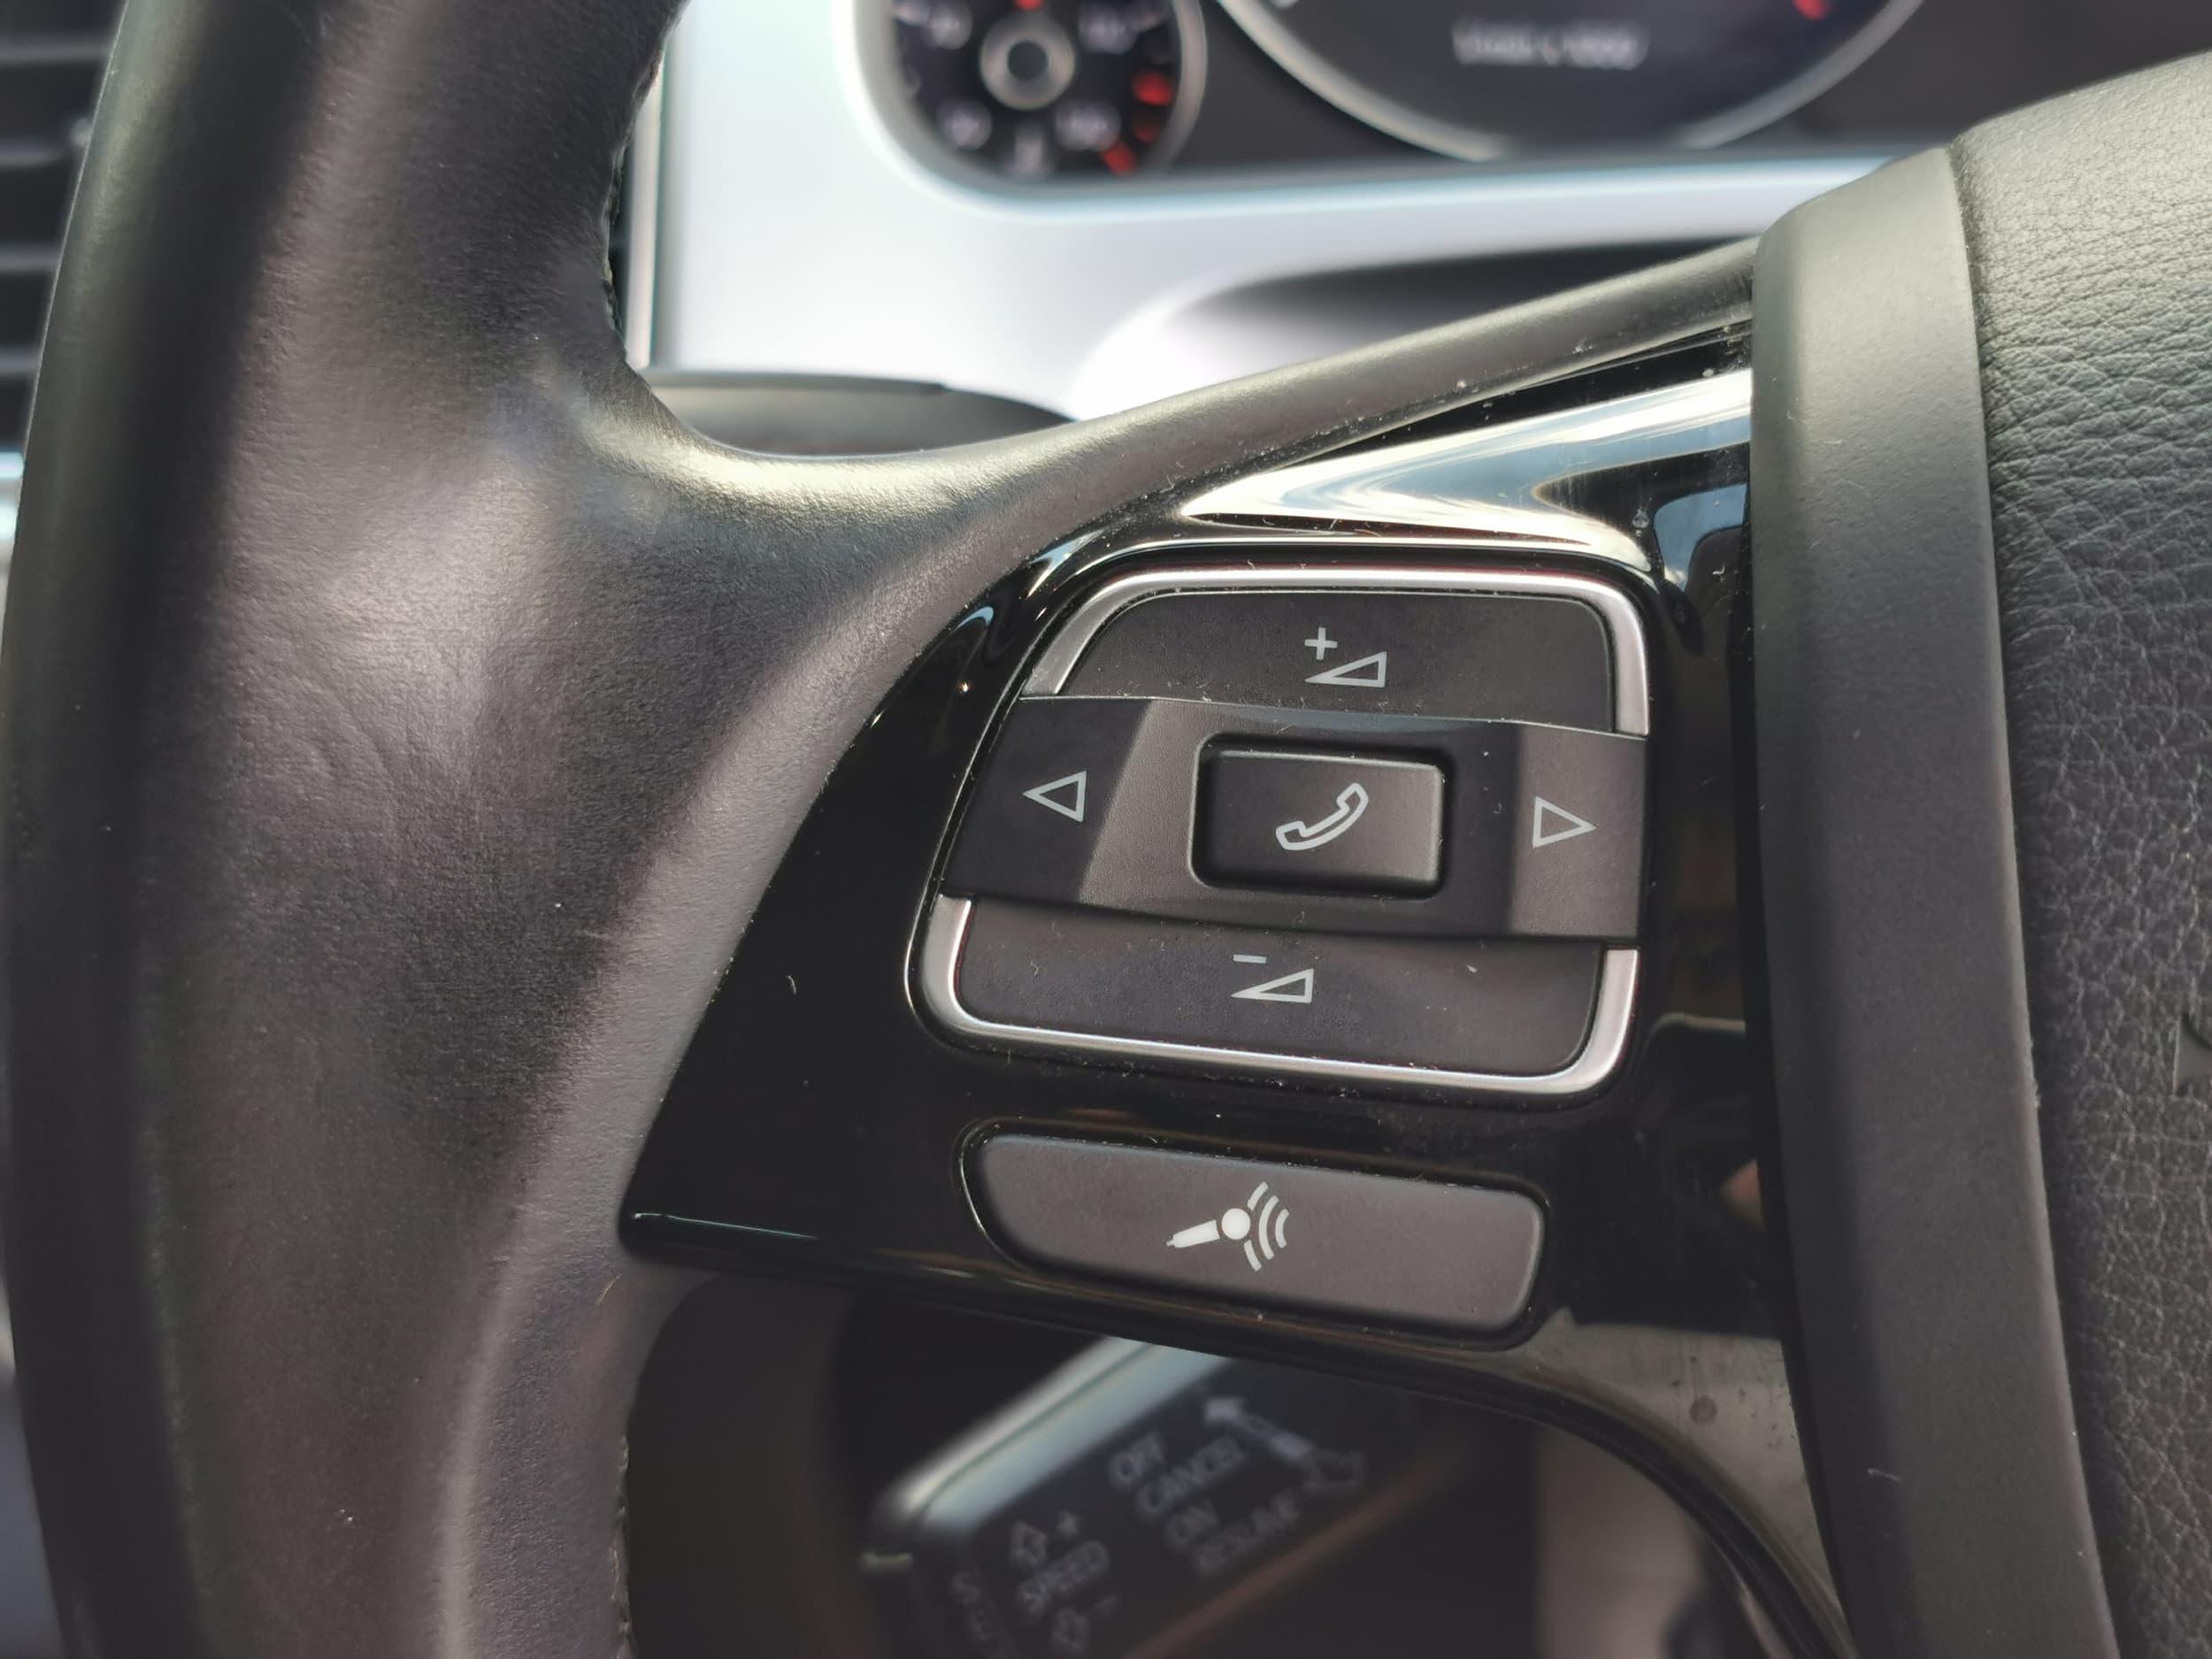 2015 Volkswagen Touareg V6 TDI 7P Auto 4MOTION MY16 - image 11